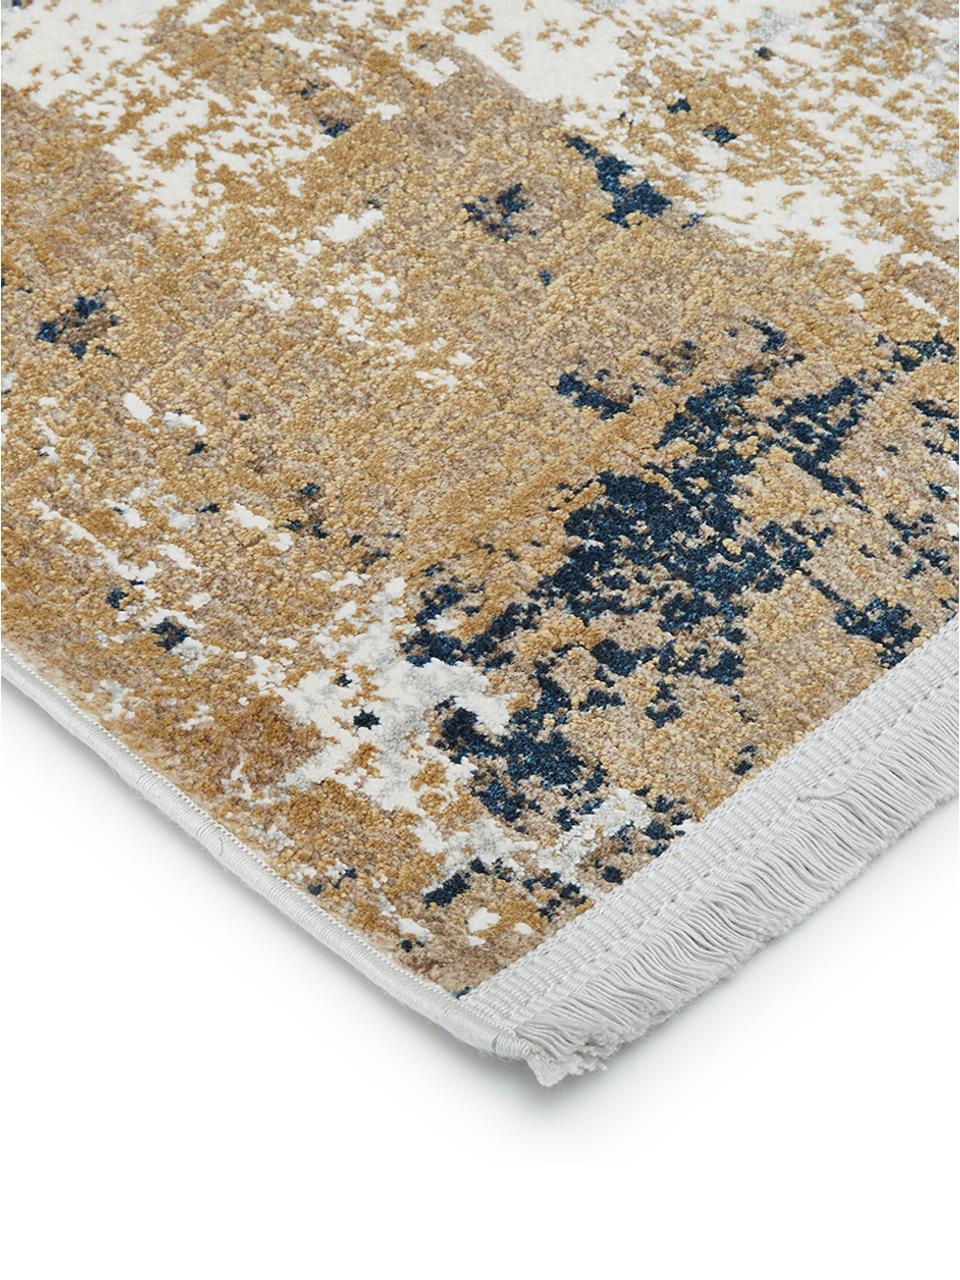 Teppich Verona mit abstraktem Muster, Flor: Viskose, Acryl, Creme, Beige, Grau, Braun, Dunkelblau, B 160 x L 230 cm (Größe M)